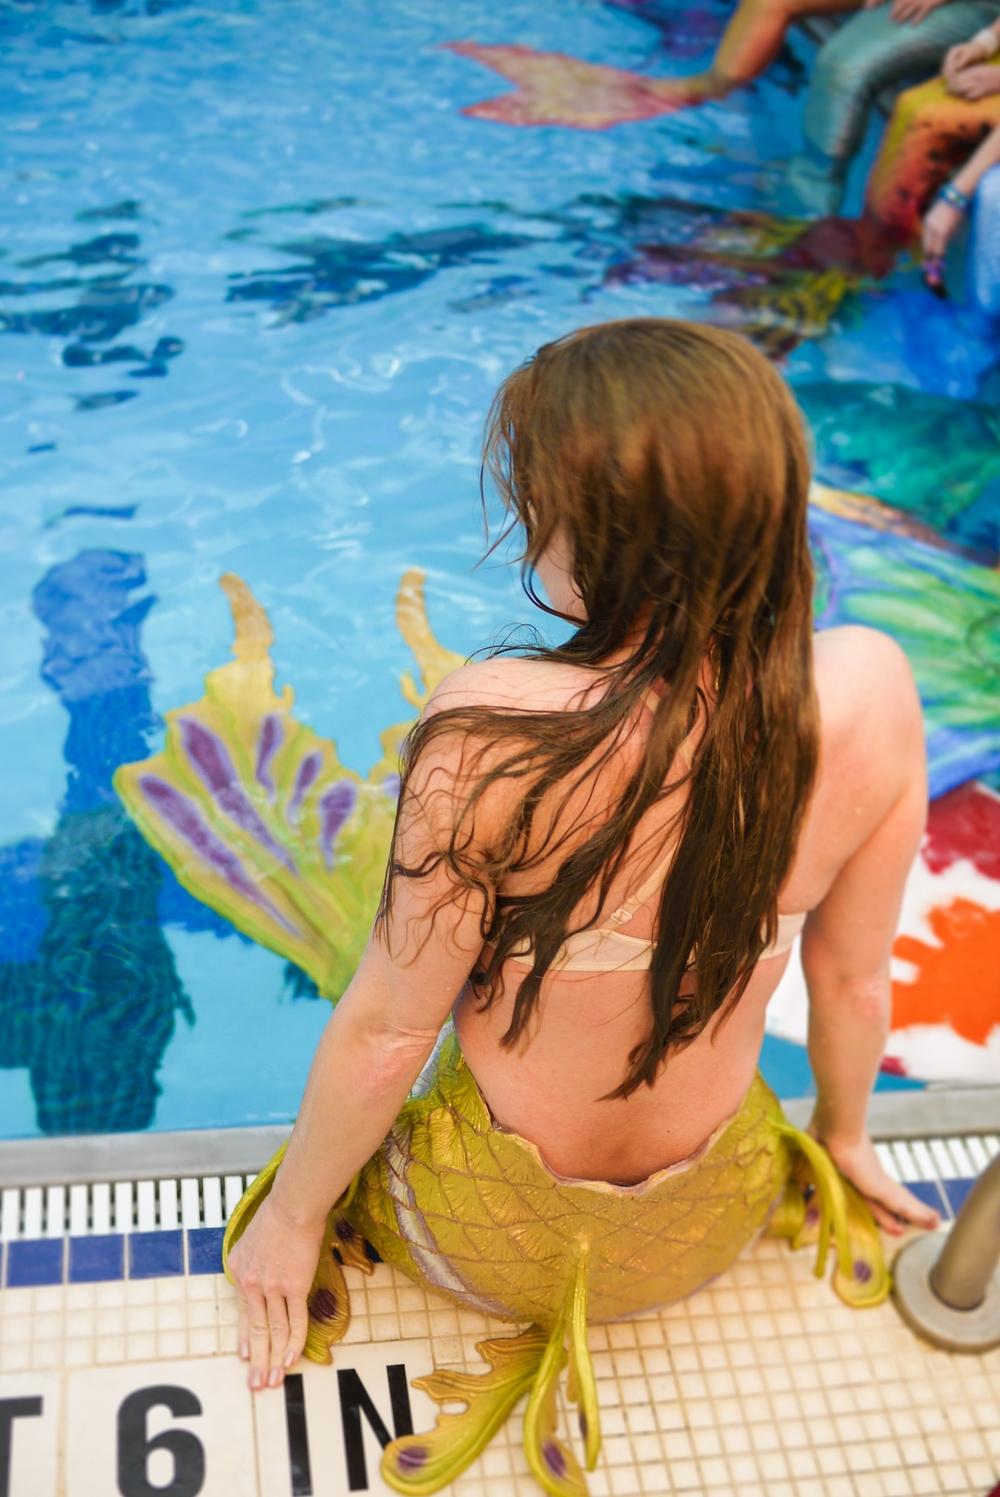 Poolside at Merfest 2015